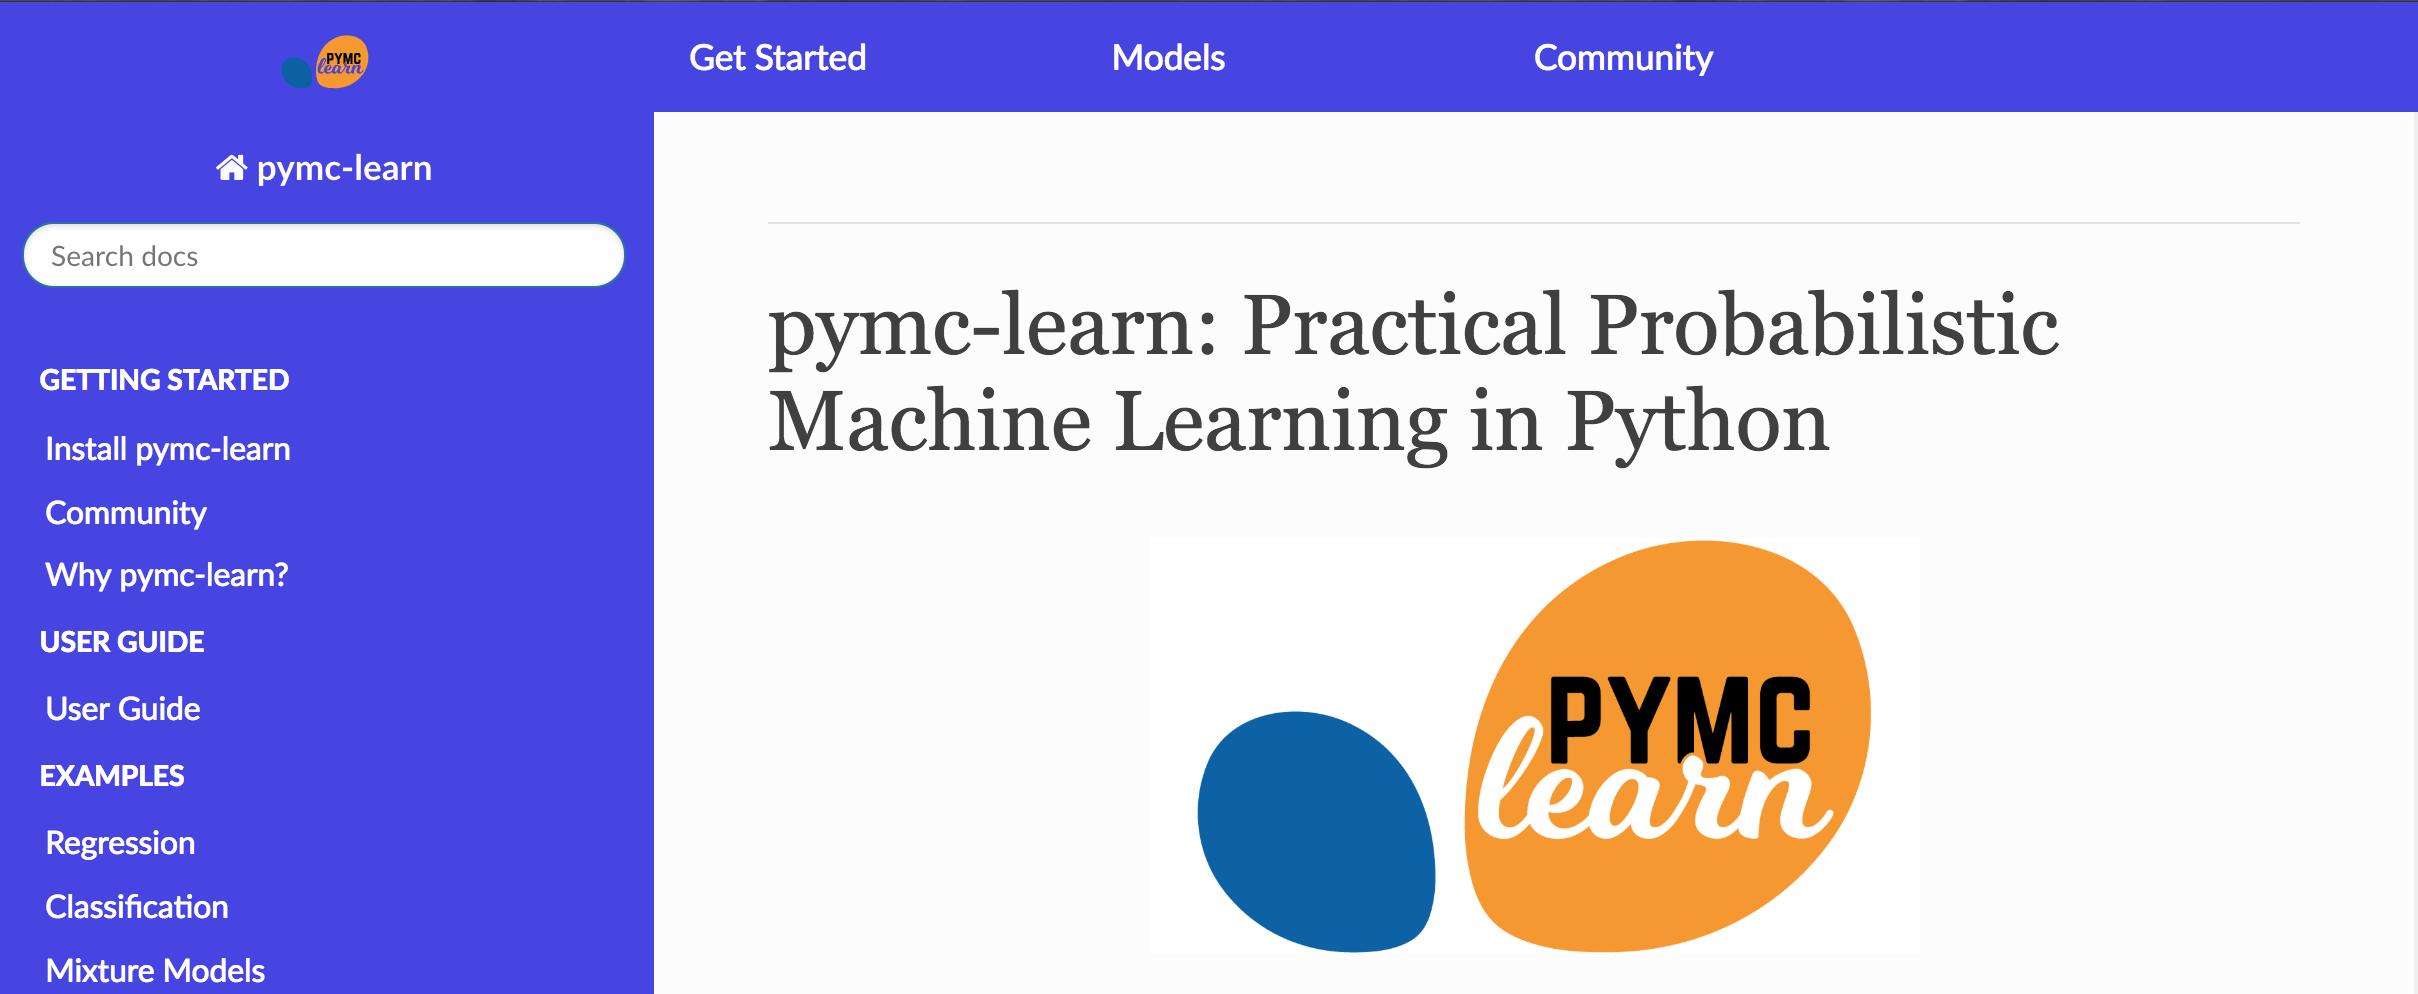 Pymc-Learn: Practical Probabilistic Machine Learning in Python